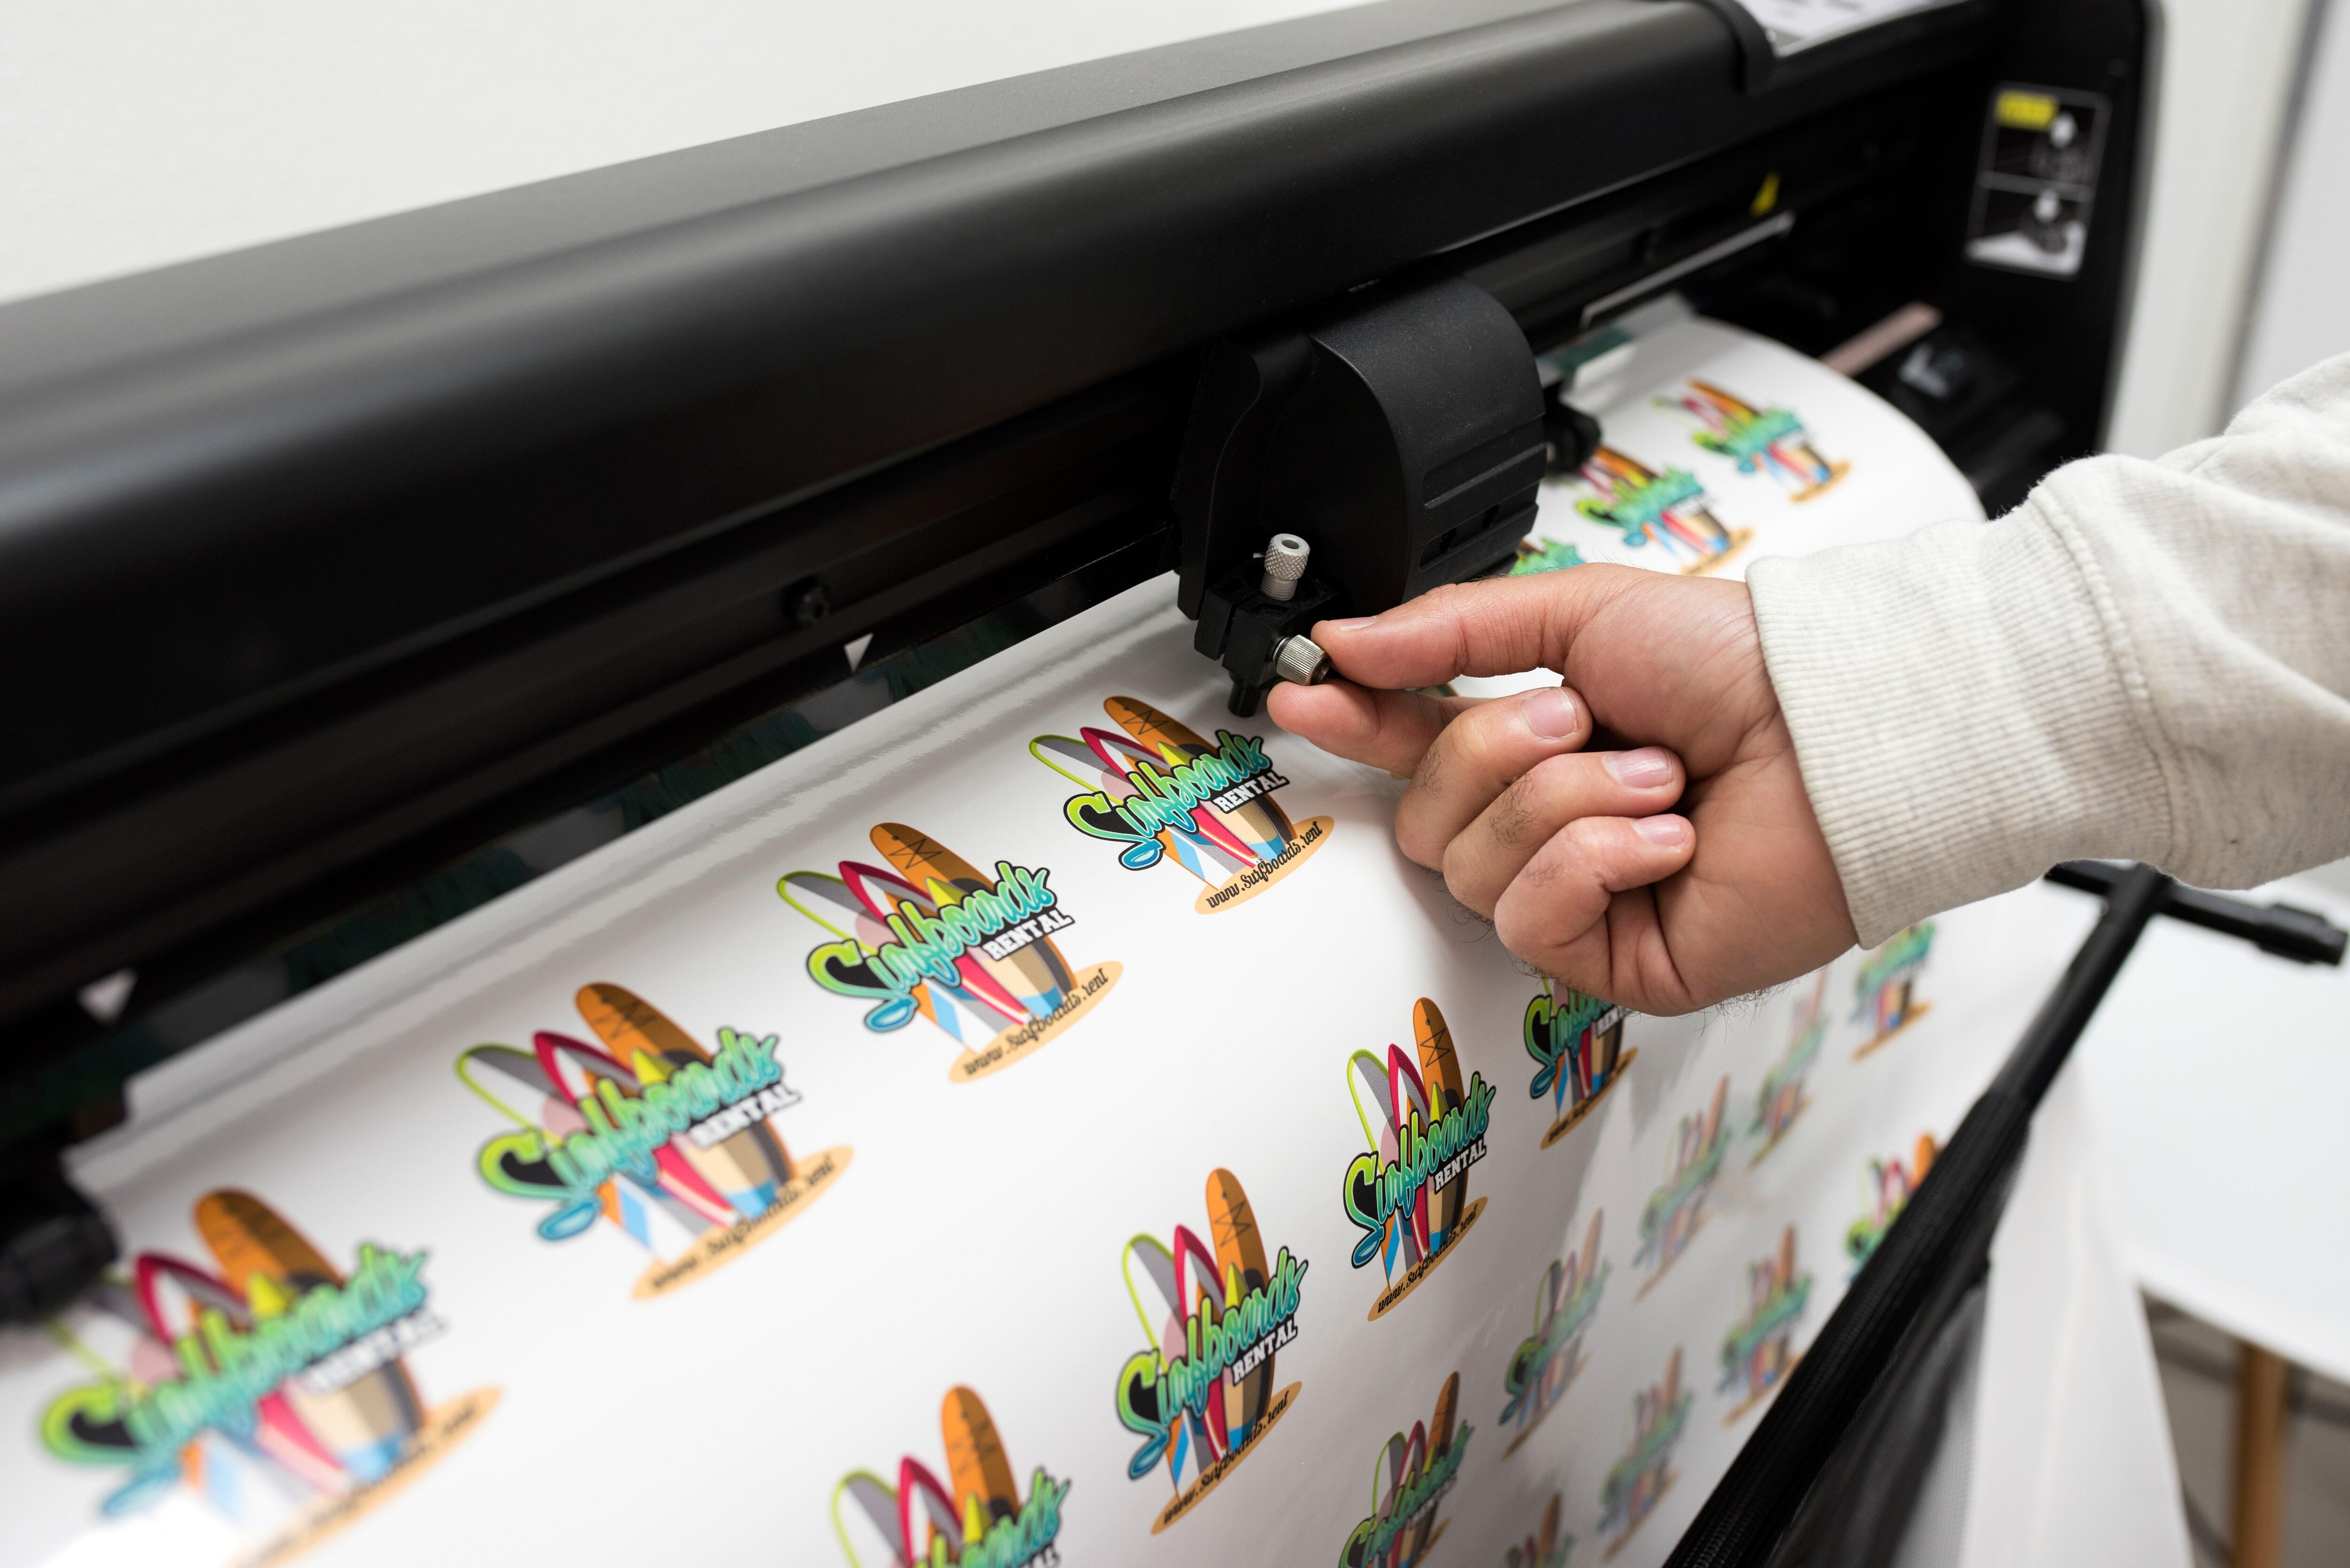 Программно-аппаратный комплекс для широкоформатной печати и плоттерной резкиHP Latex 335 Print and Cut Solution - фото 7